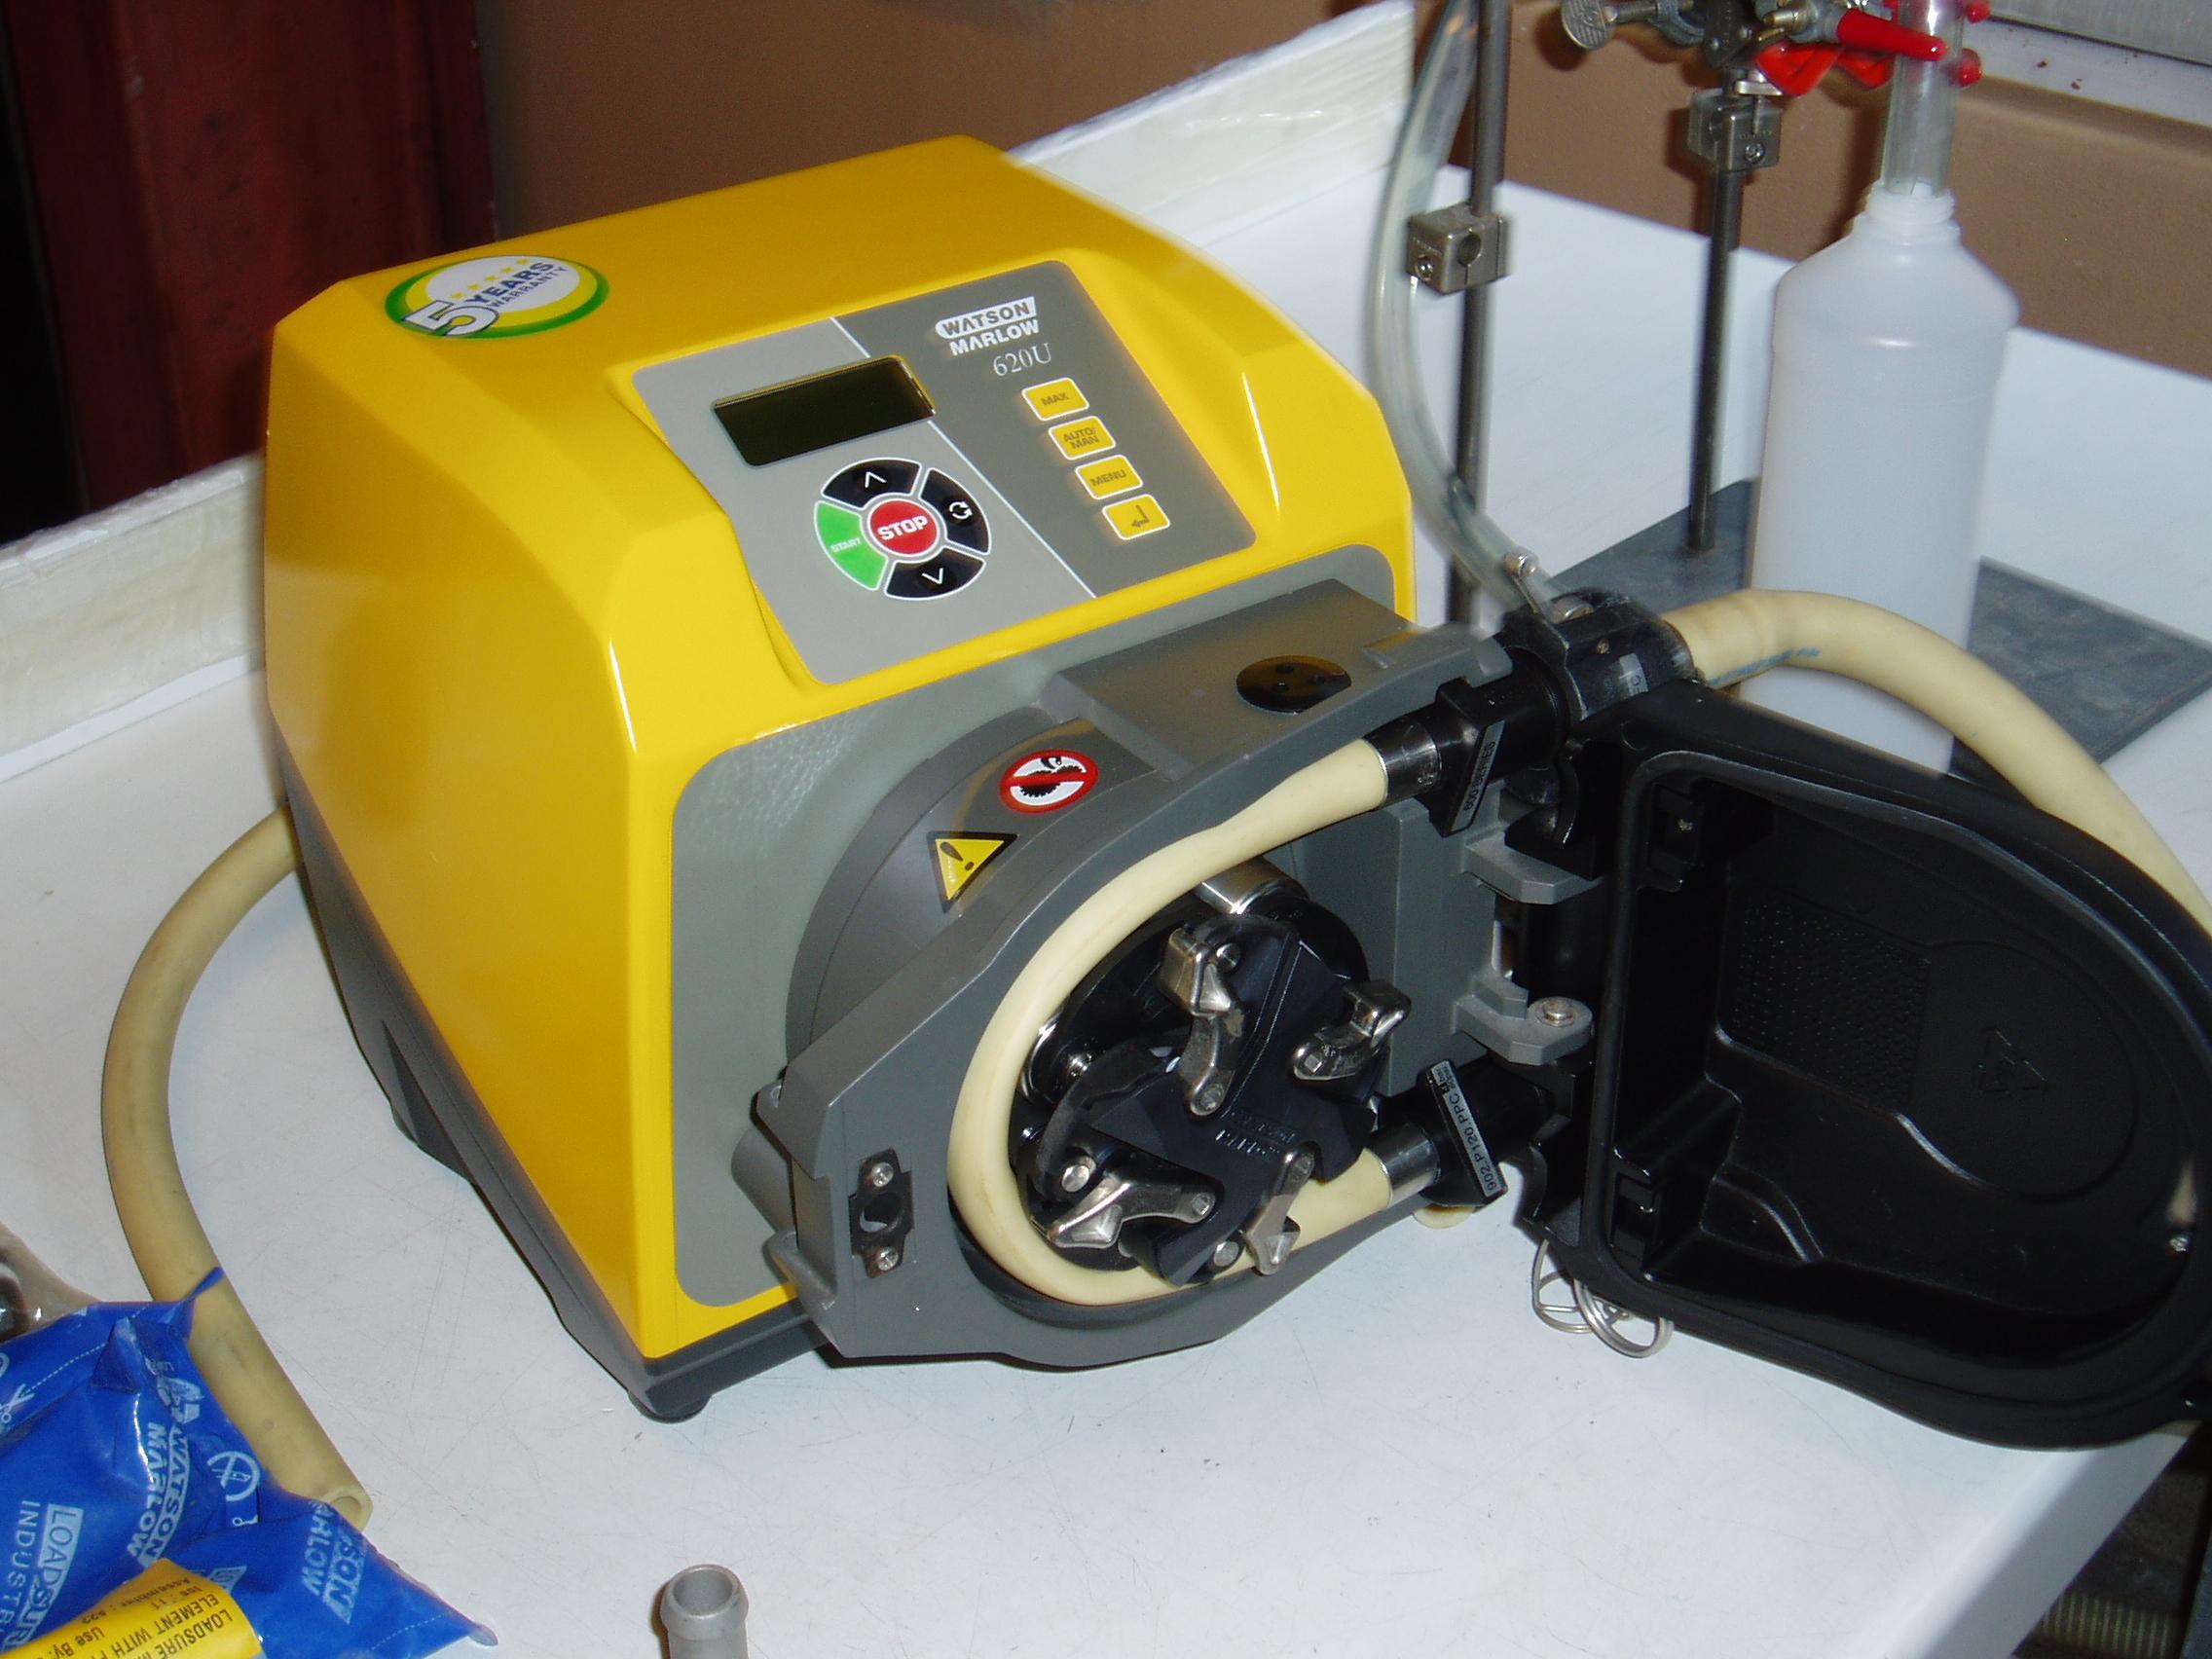 Bomba watson marlow pompe 620u maquinas de segunda mano - Bombas para sacar gasoil de segunda mano ...